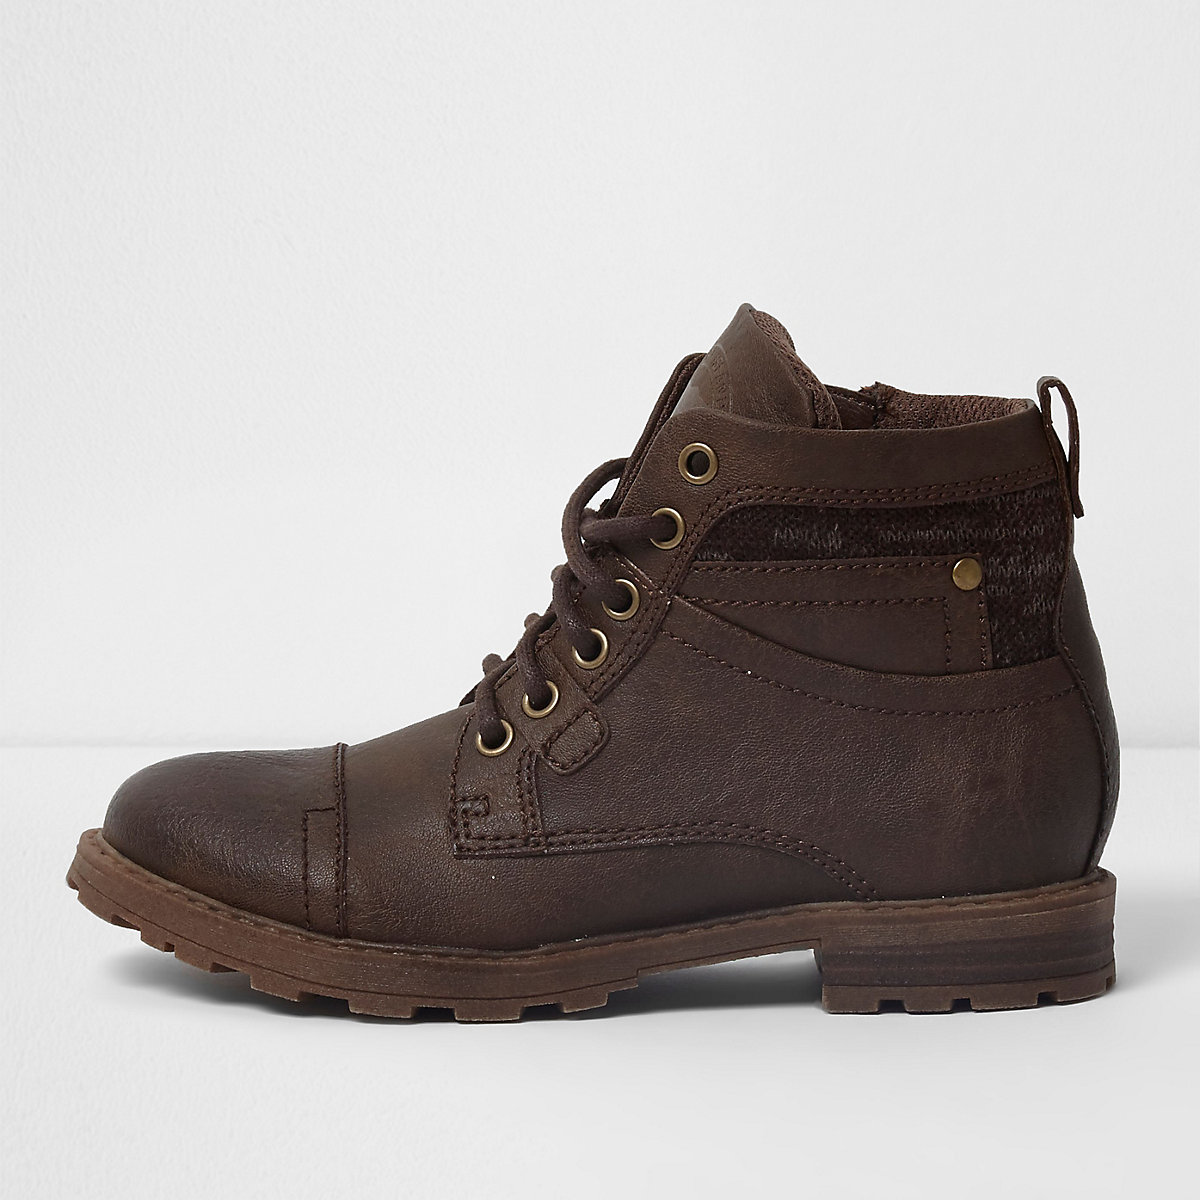 Boys dark brown mixed fabric work boots